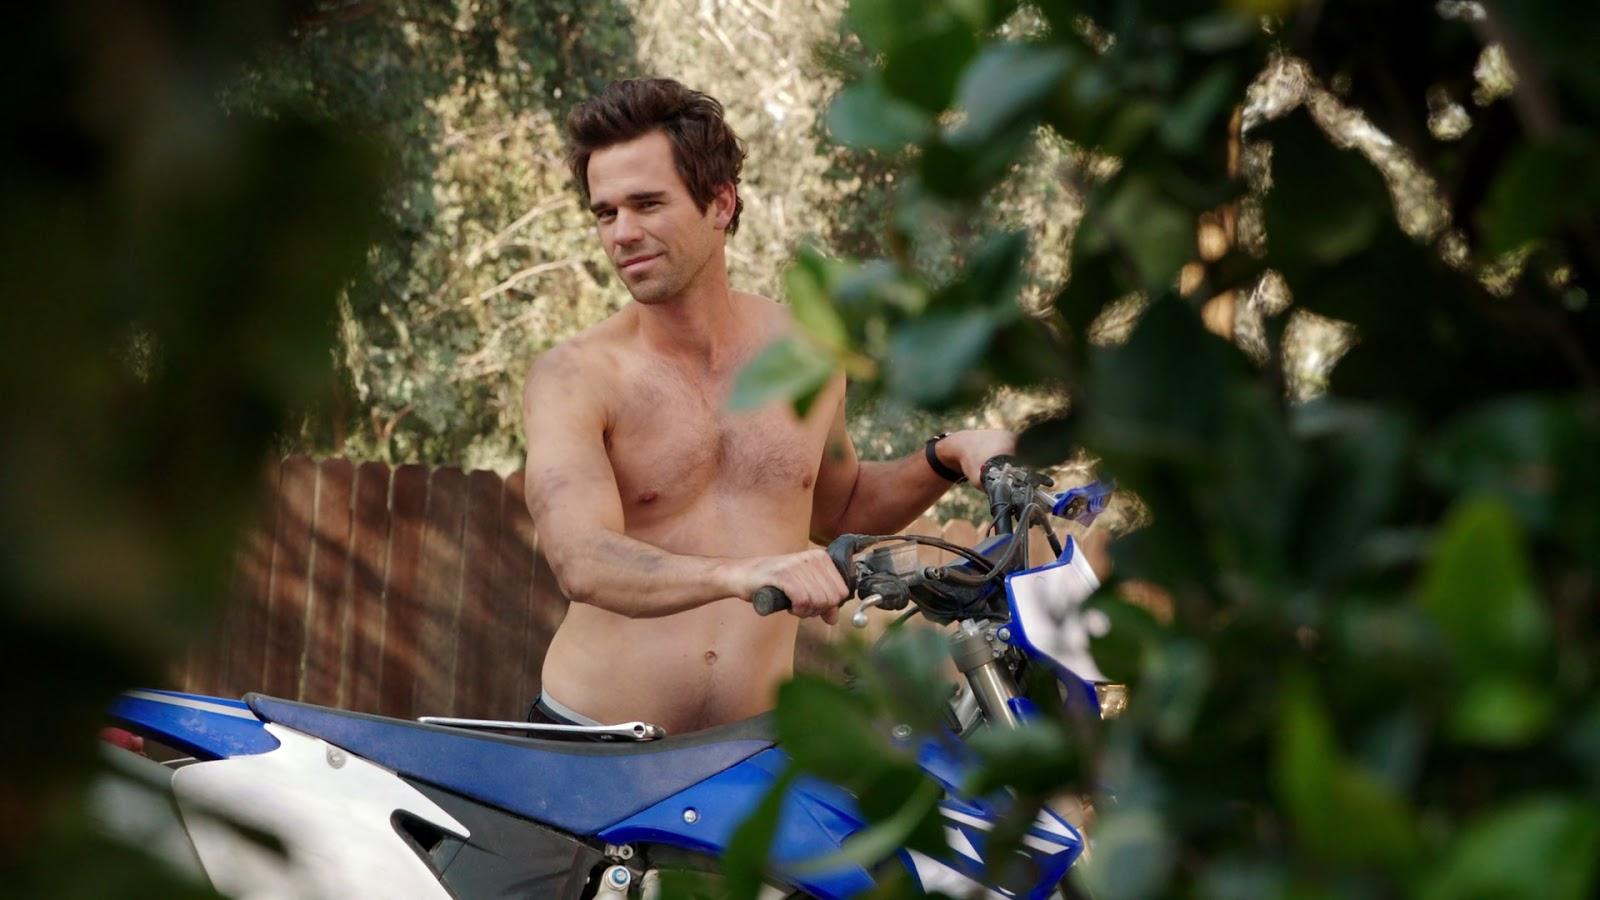 David Walton Nude